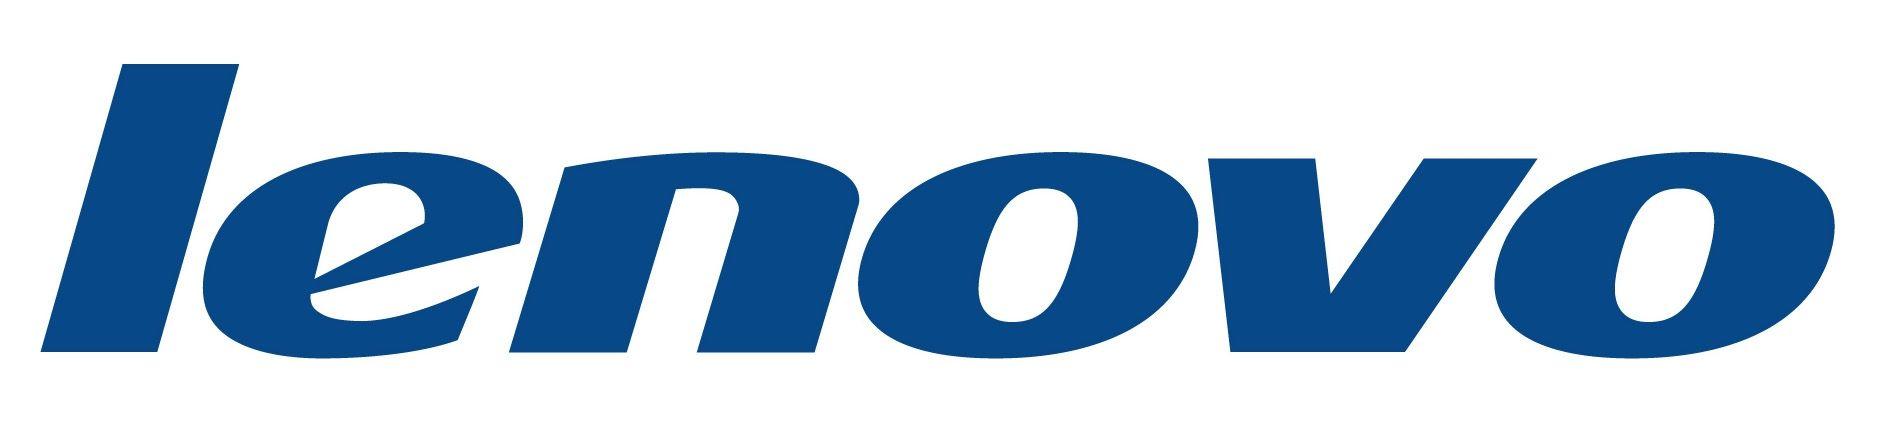 Imagini pentru logo lenovo